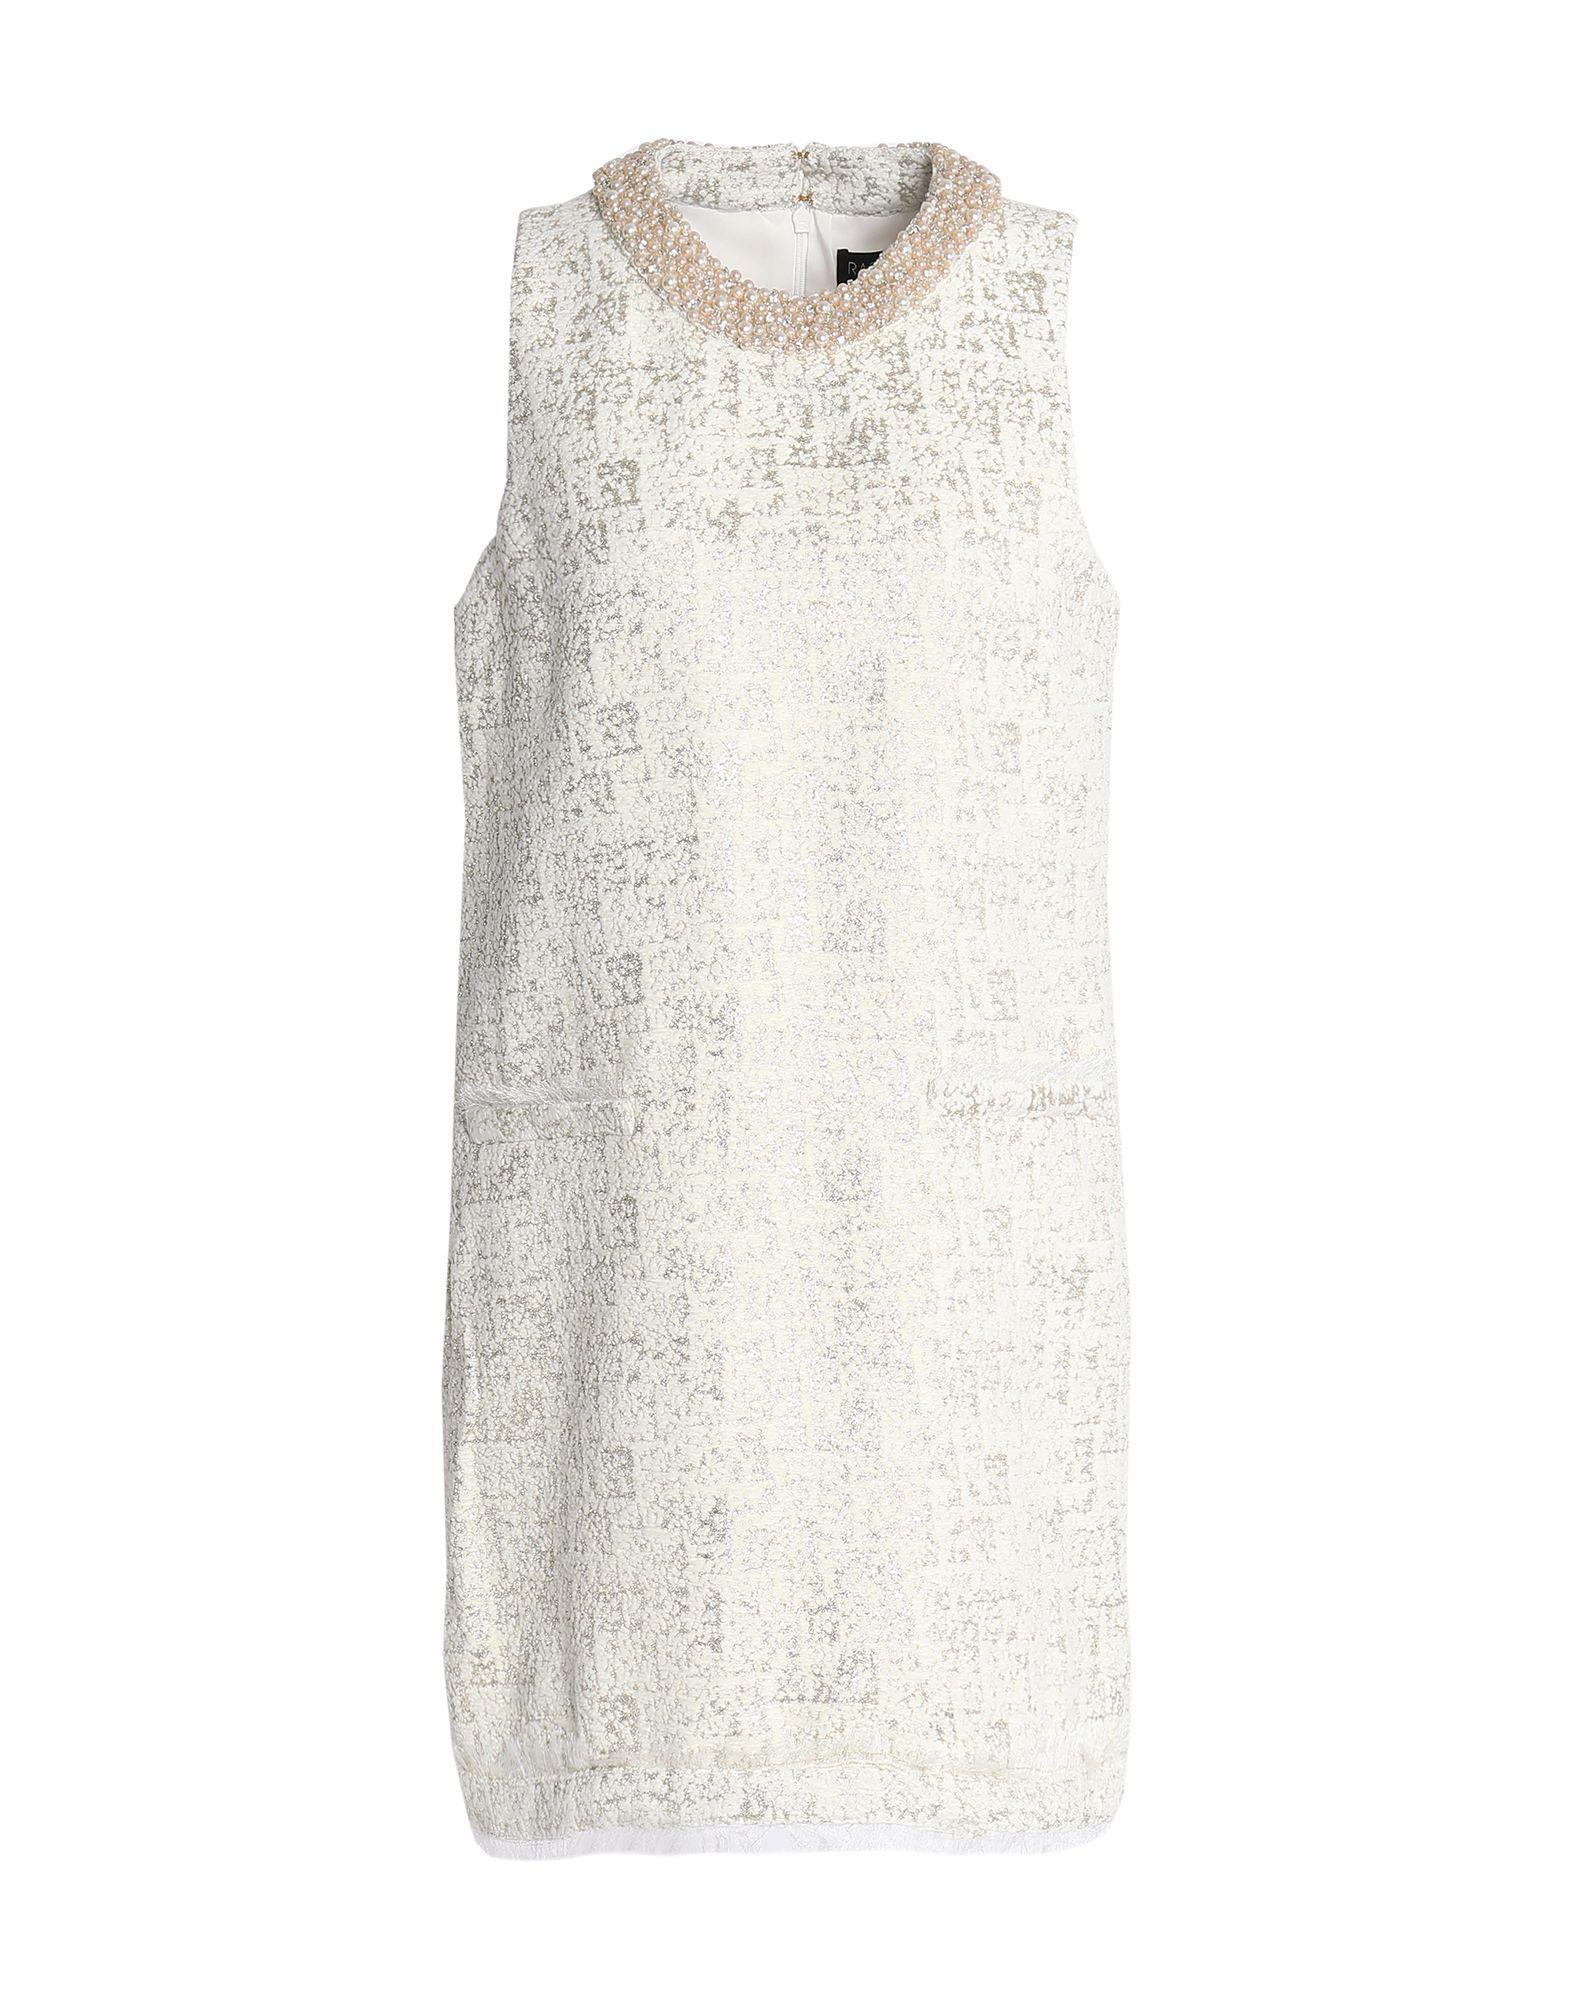 9e401cf0071 Lyst - Rachel Zoe Short Dress in White - Save 56%